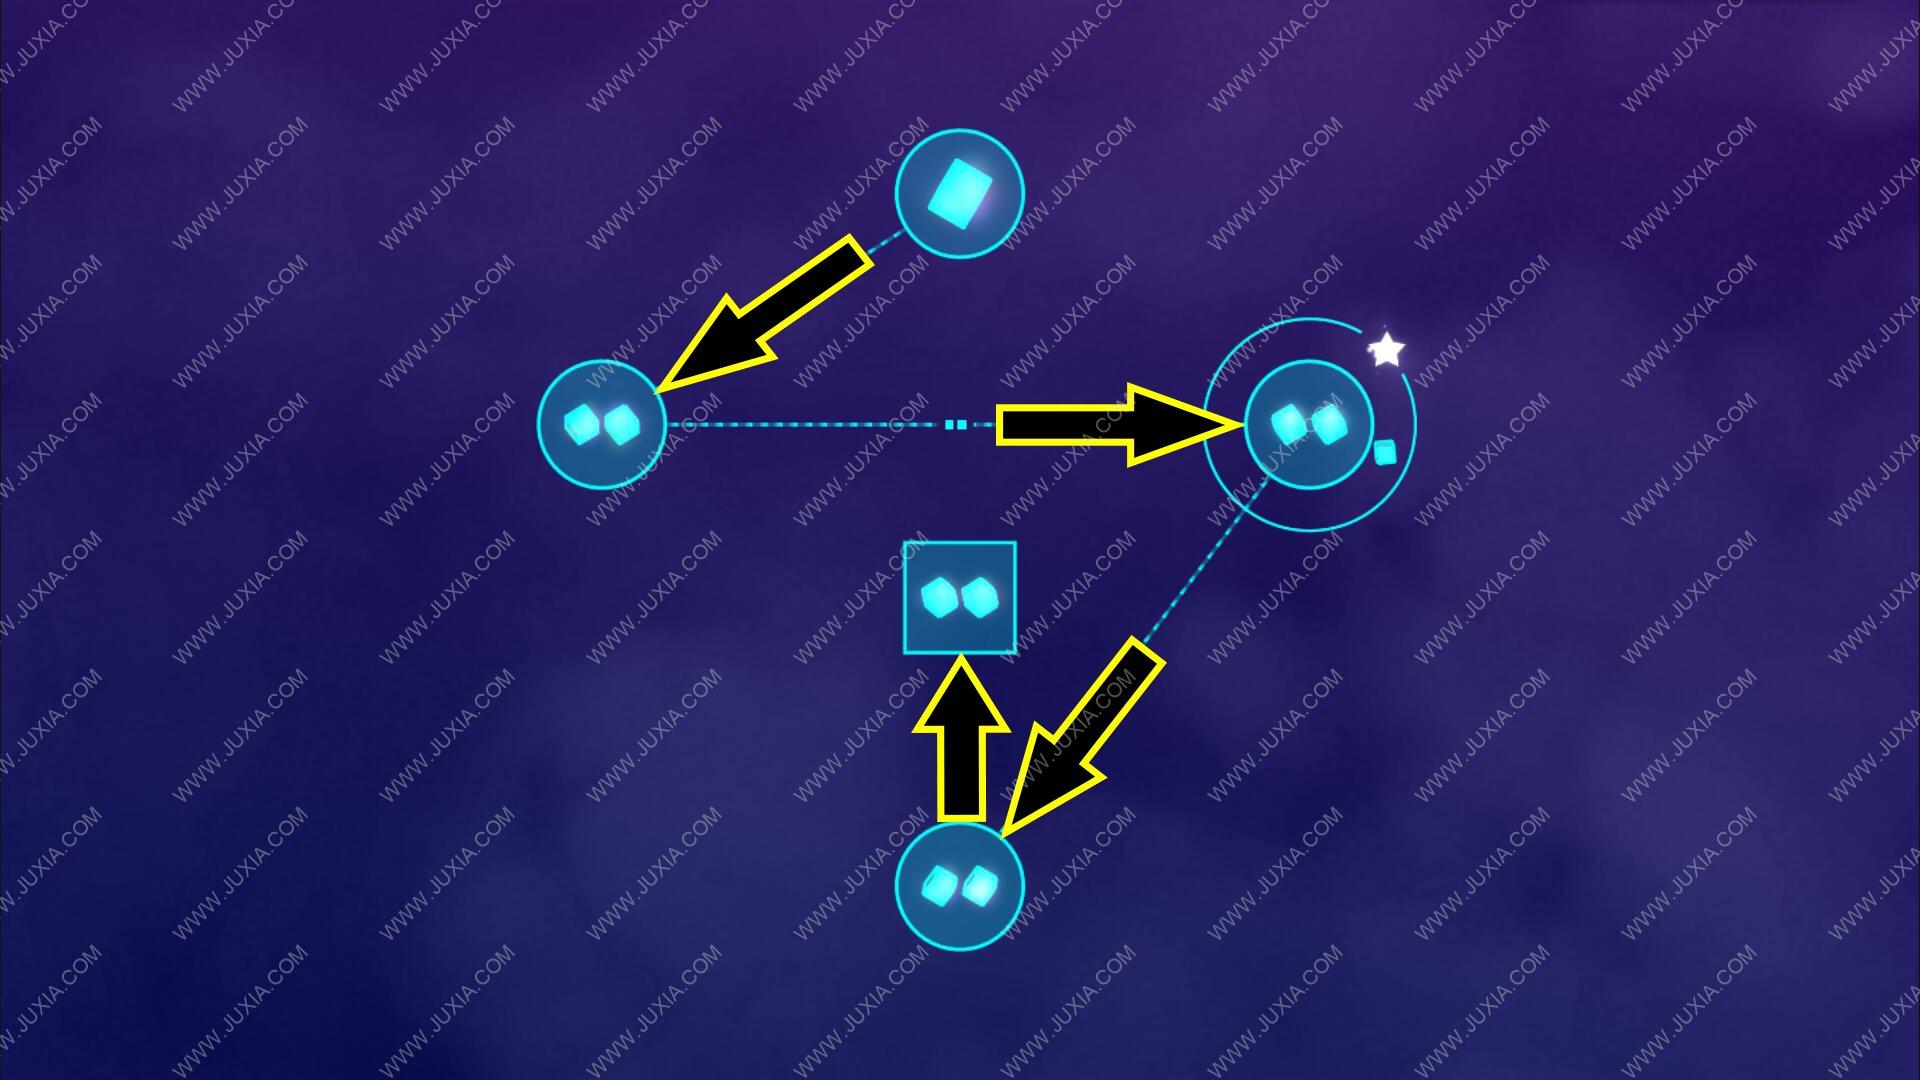 传输Transmission游戏攻略第三大关 Transmission3星通关攻略